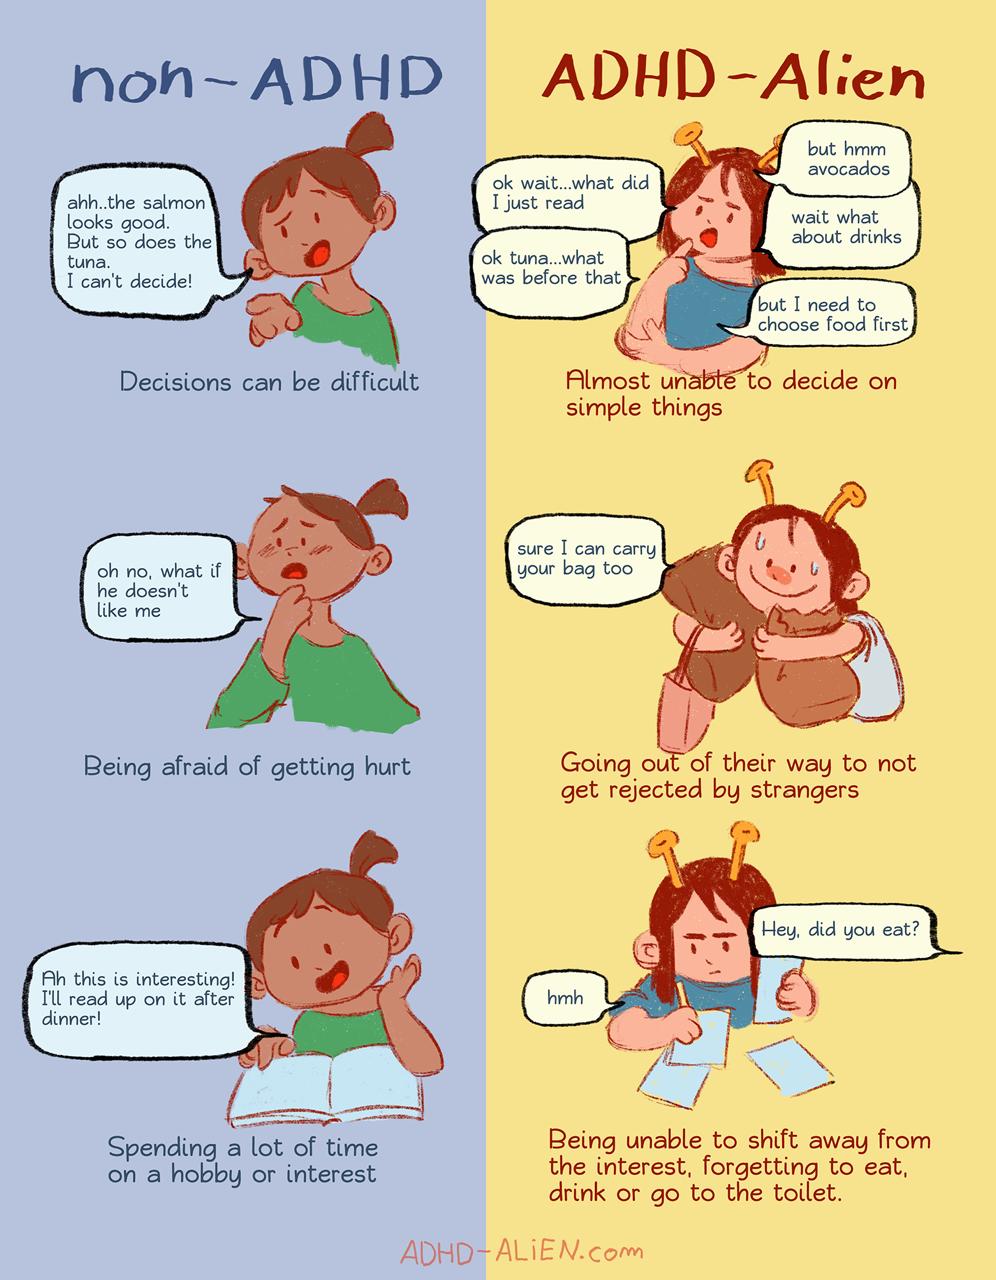 ADHD Symptom Severity vs Neurotypical